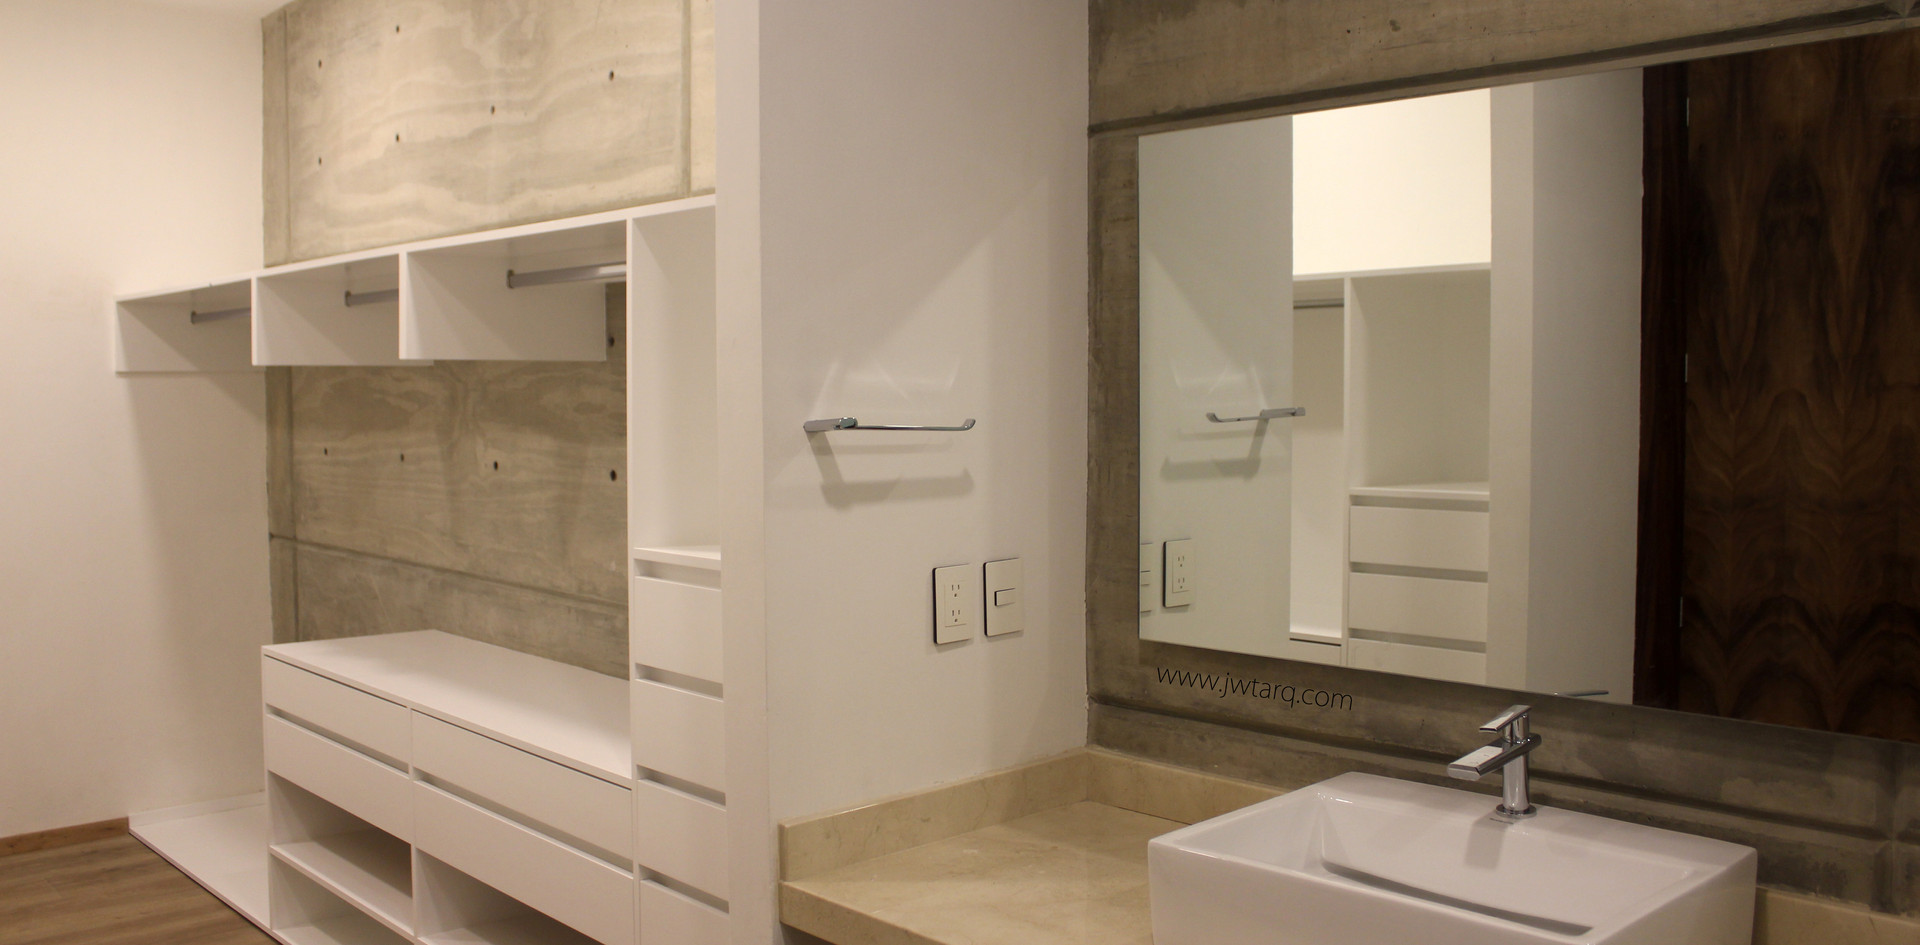 Waling closet + Sink